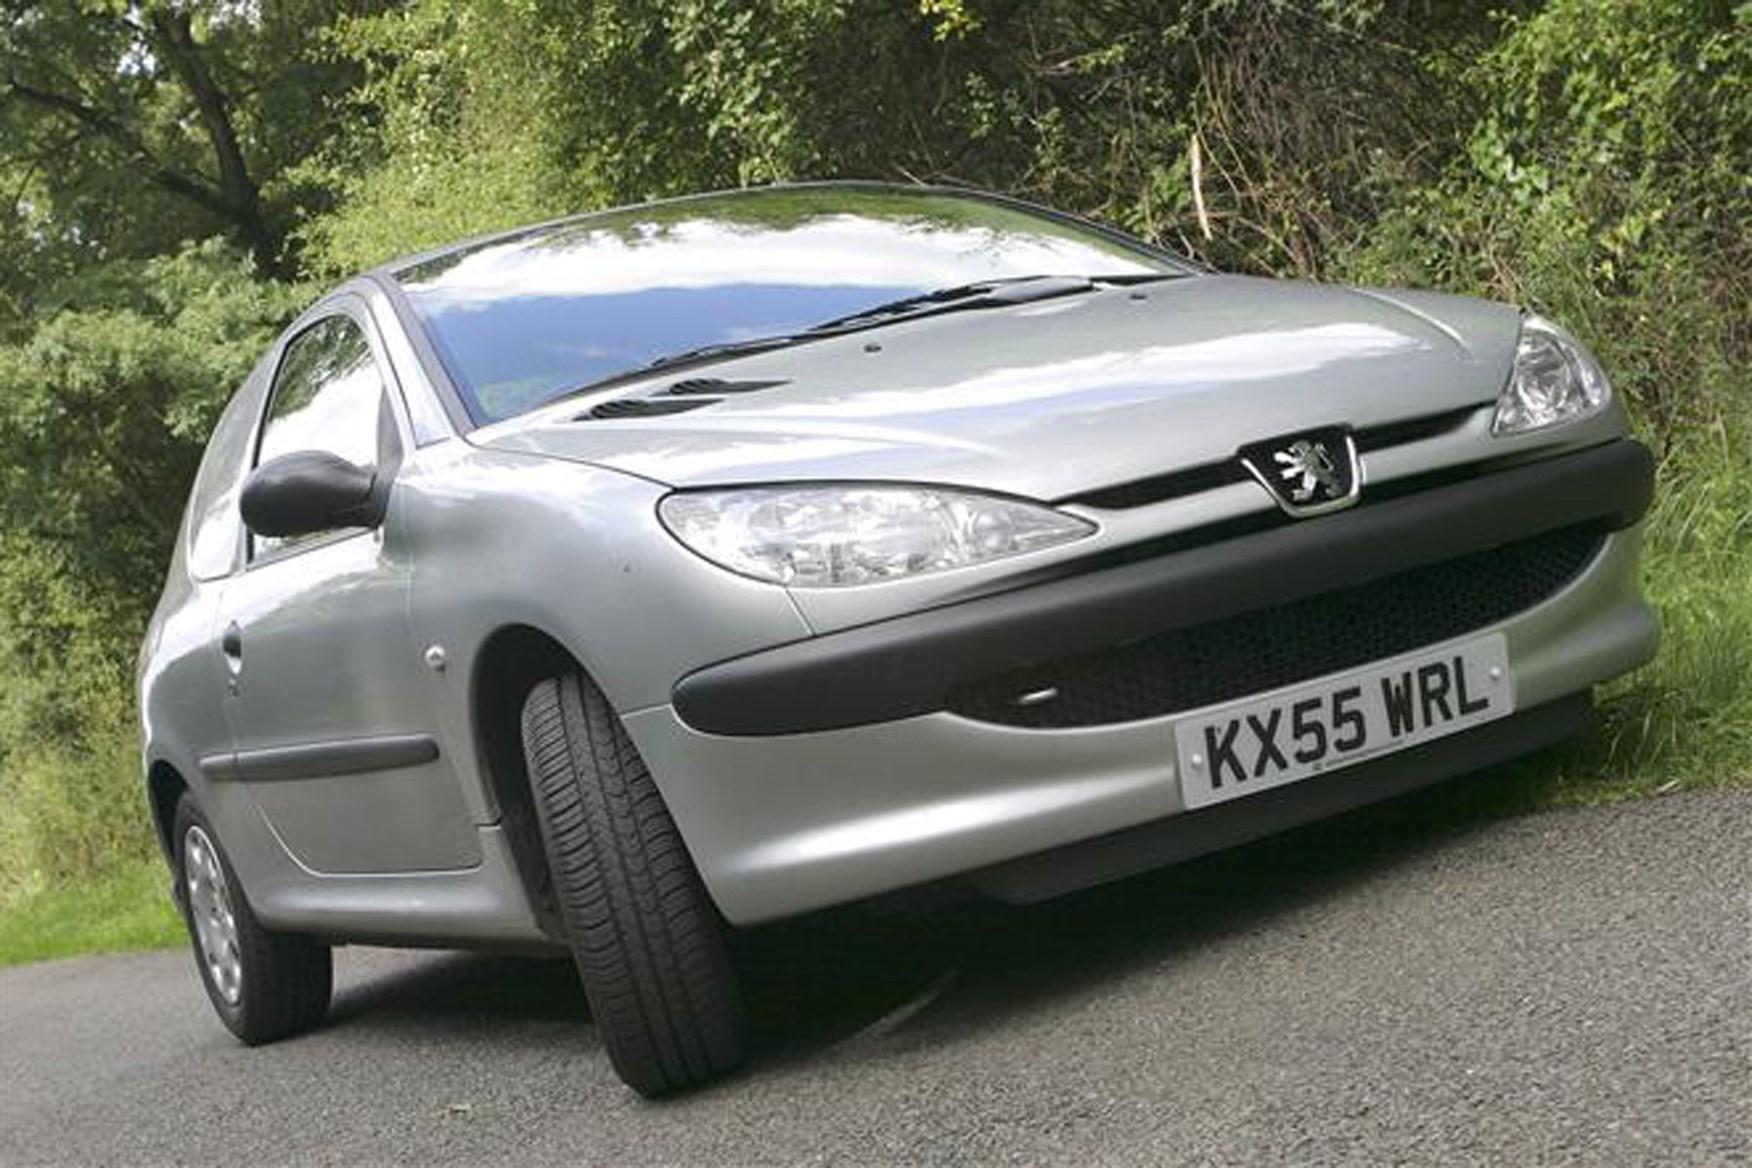 Peugeot 206 Van review on Parkers Vans - front exterior